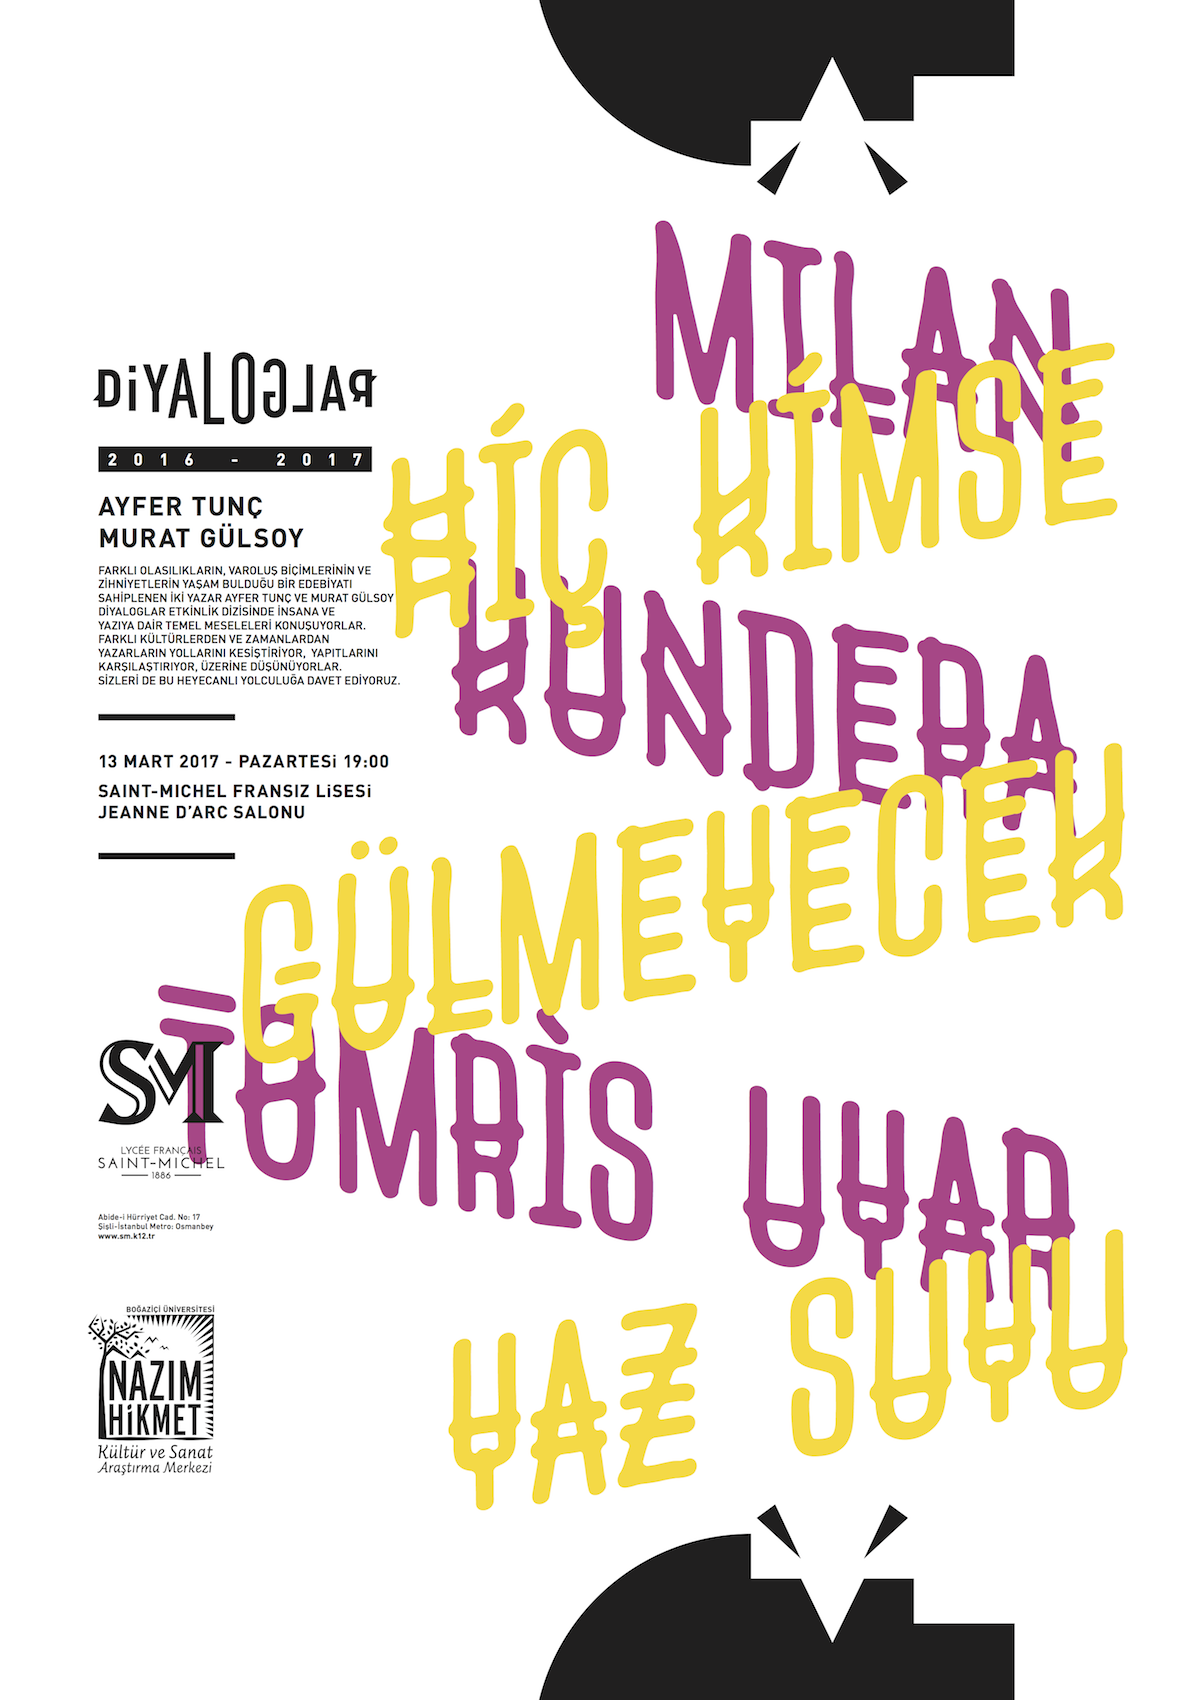 Diyaloglar 13 mart'ta: Tomris Uyar ve Milan Kundera